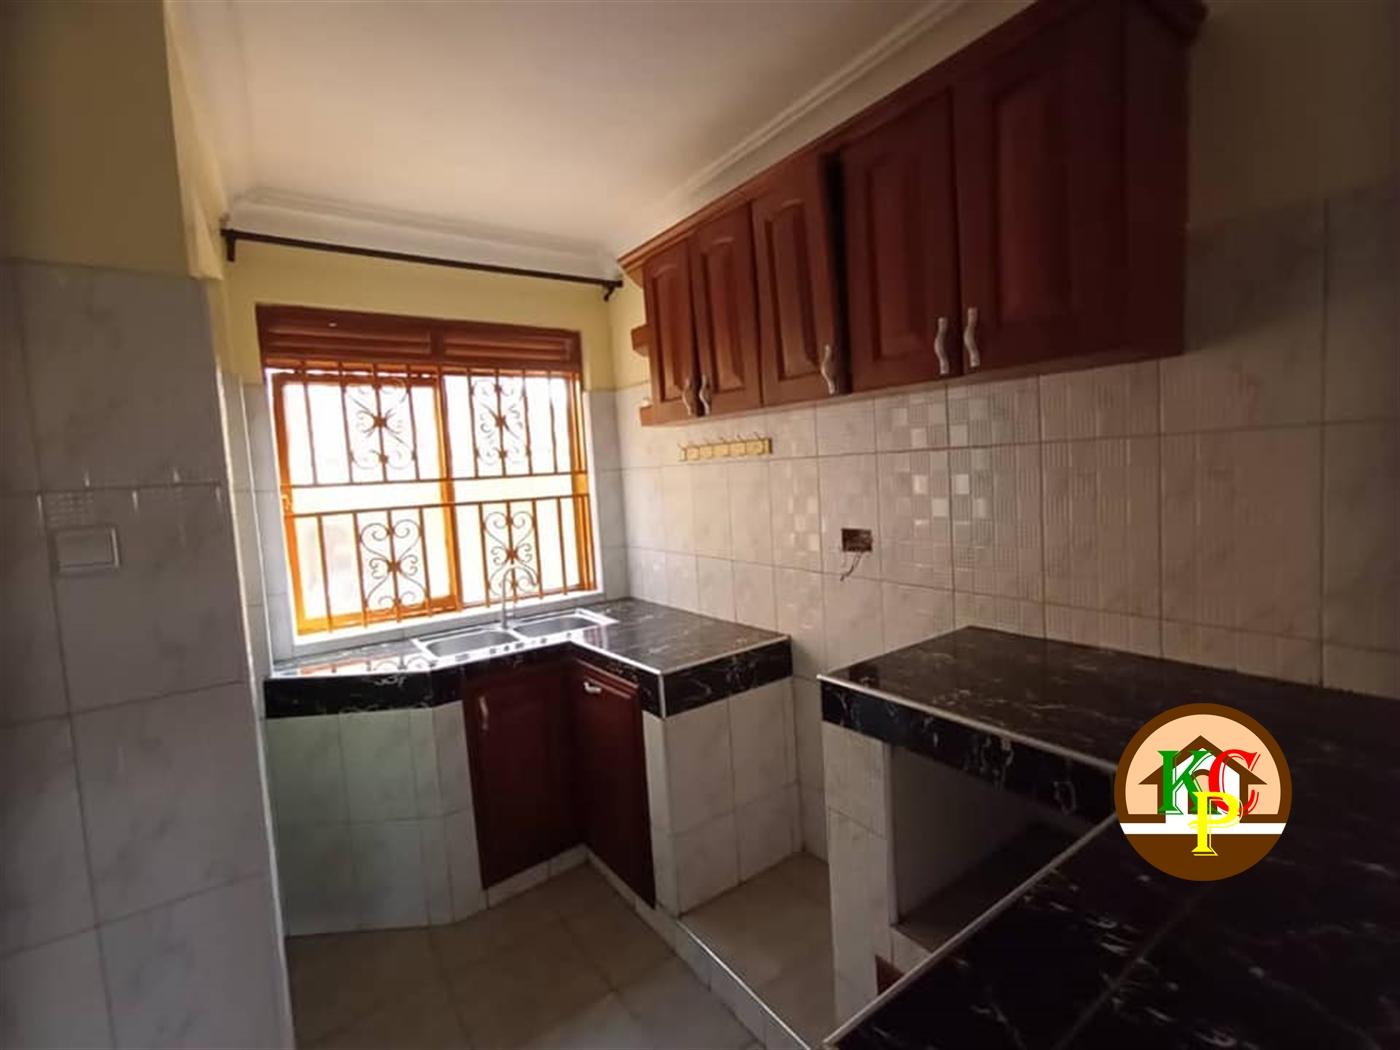 Apartment for rent in Bbunga Kampala